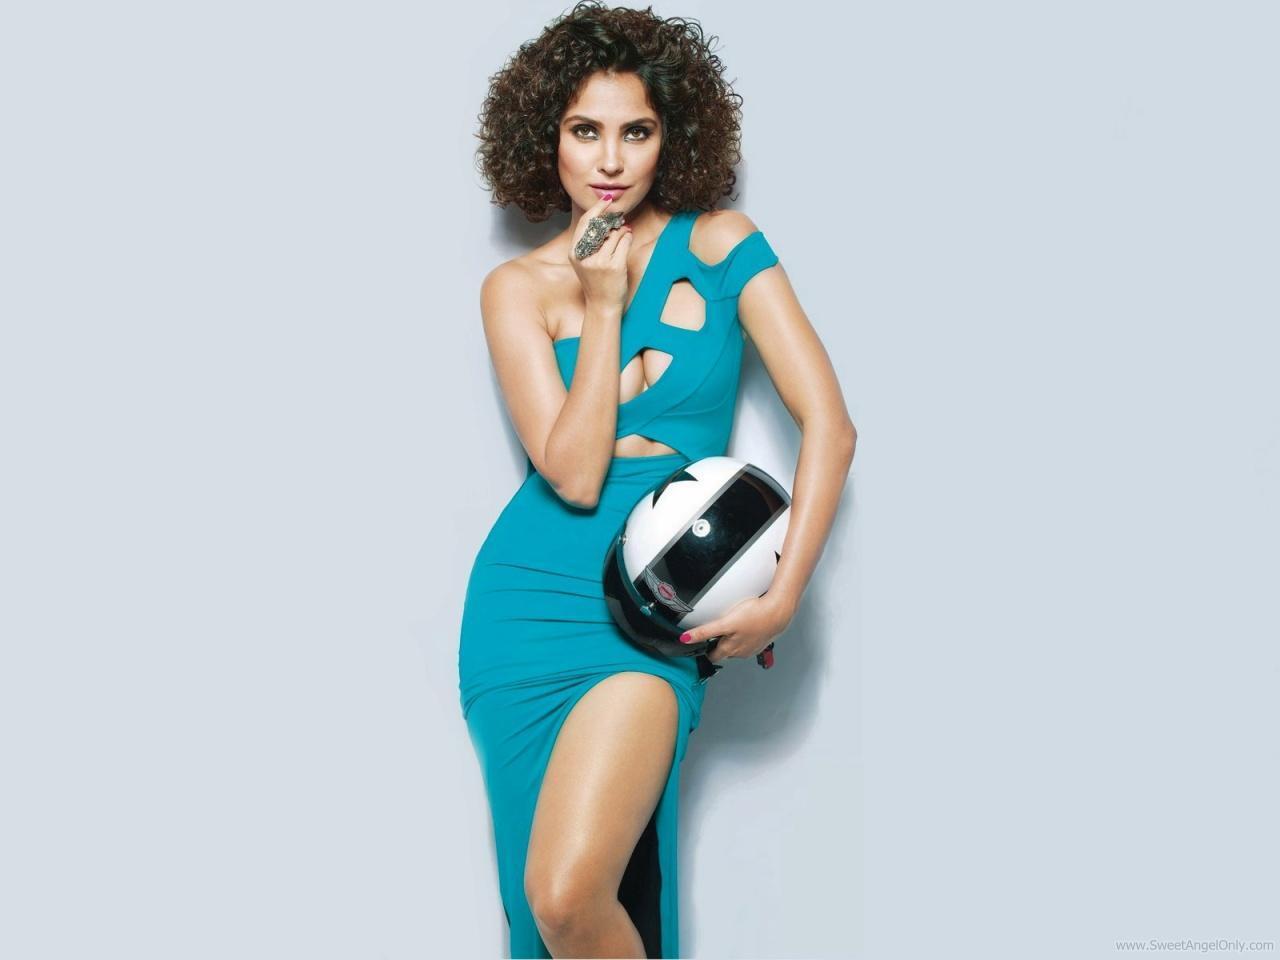 Booty Me Now: Lara Dutta Wallpapers-Don 2 Nicole Scherzinger Biography